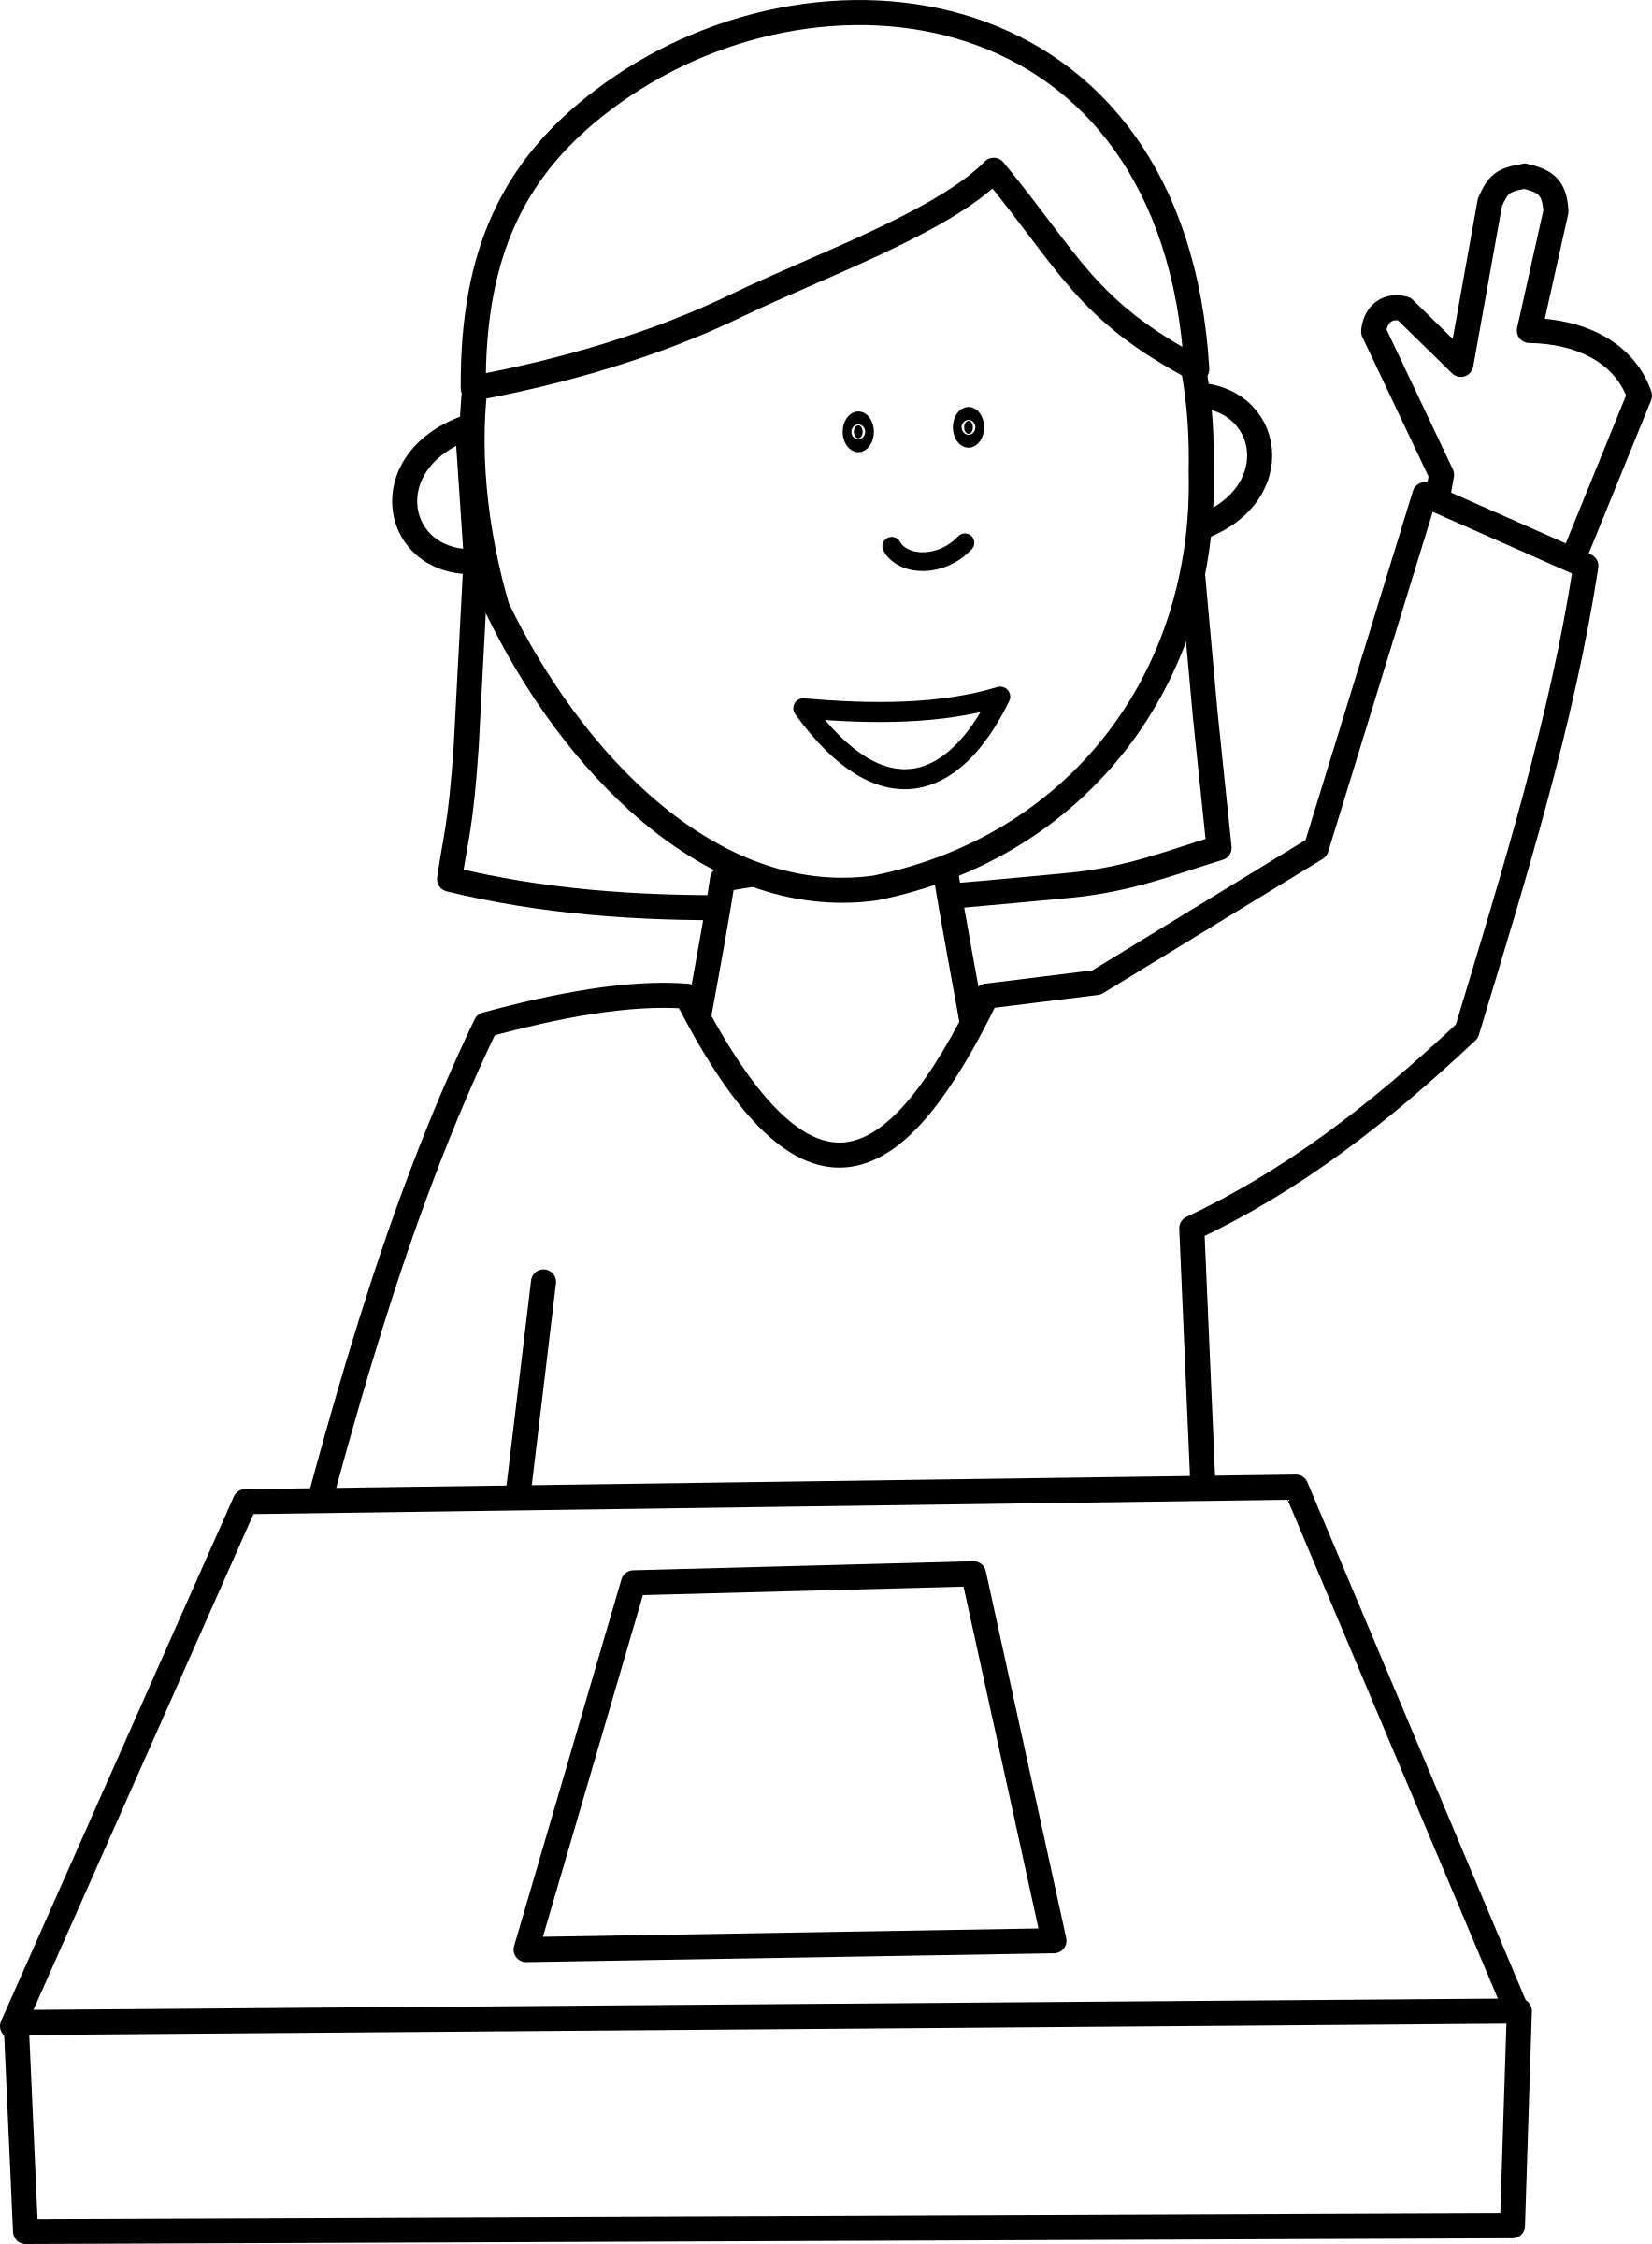 Ask for a book clipart image library download Clipart - Élève posant une question / Student asking a question image library download